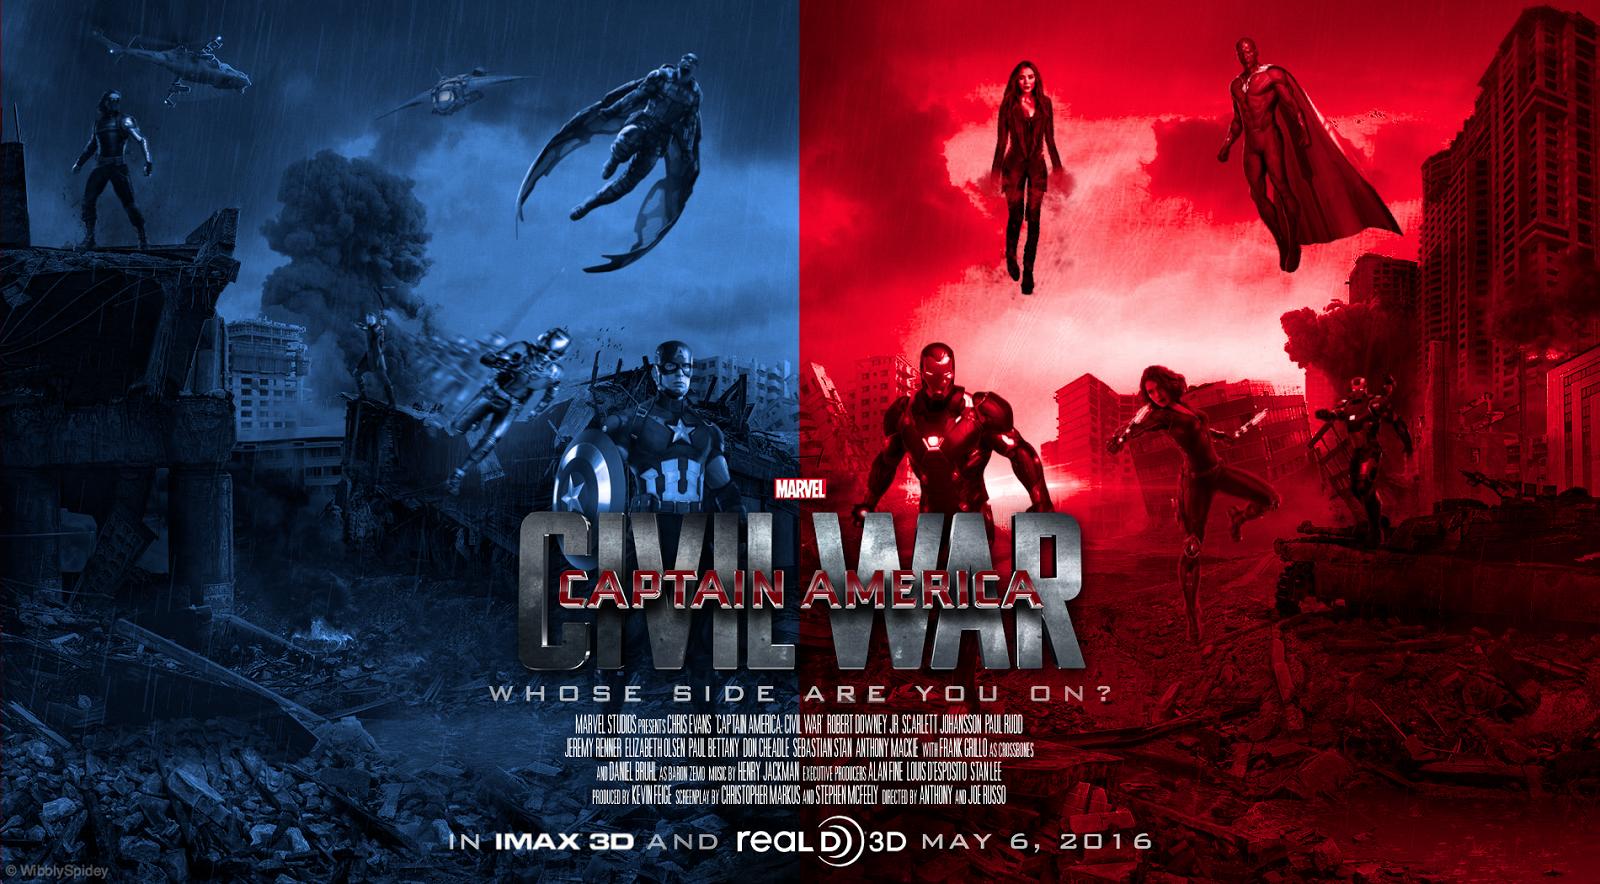 Captain America Civil War Movie Wallpapers in High Definition Desktop 1600x884